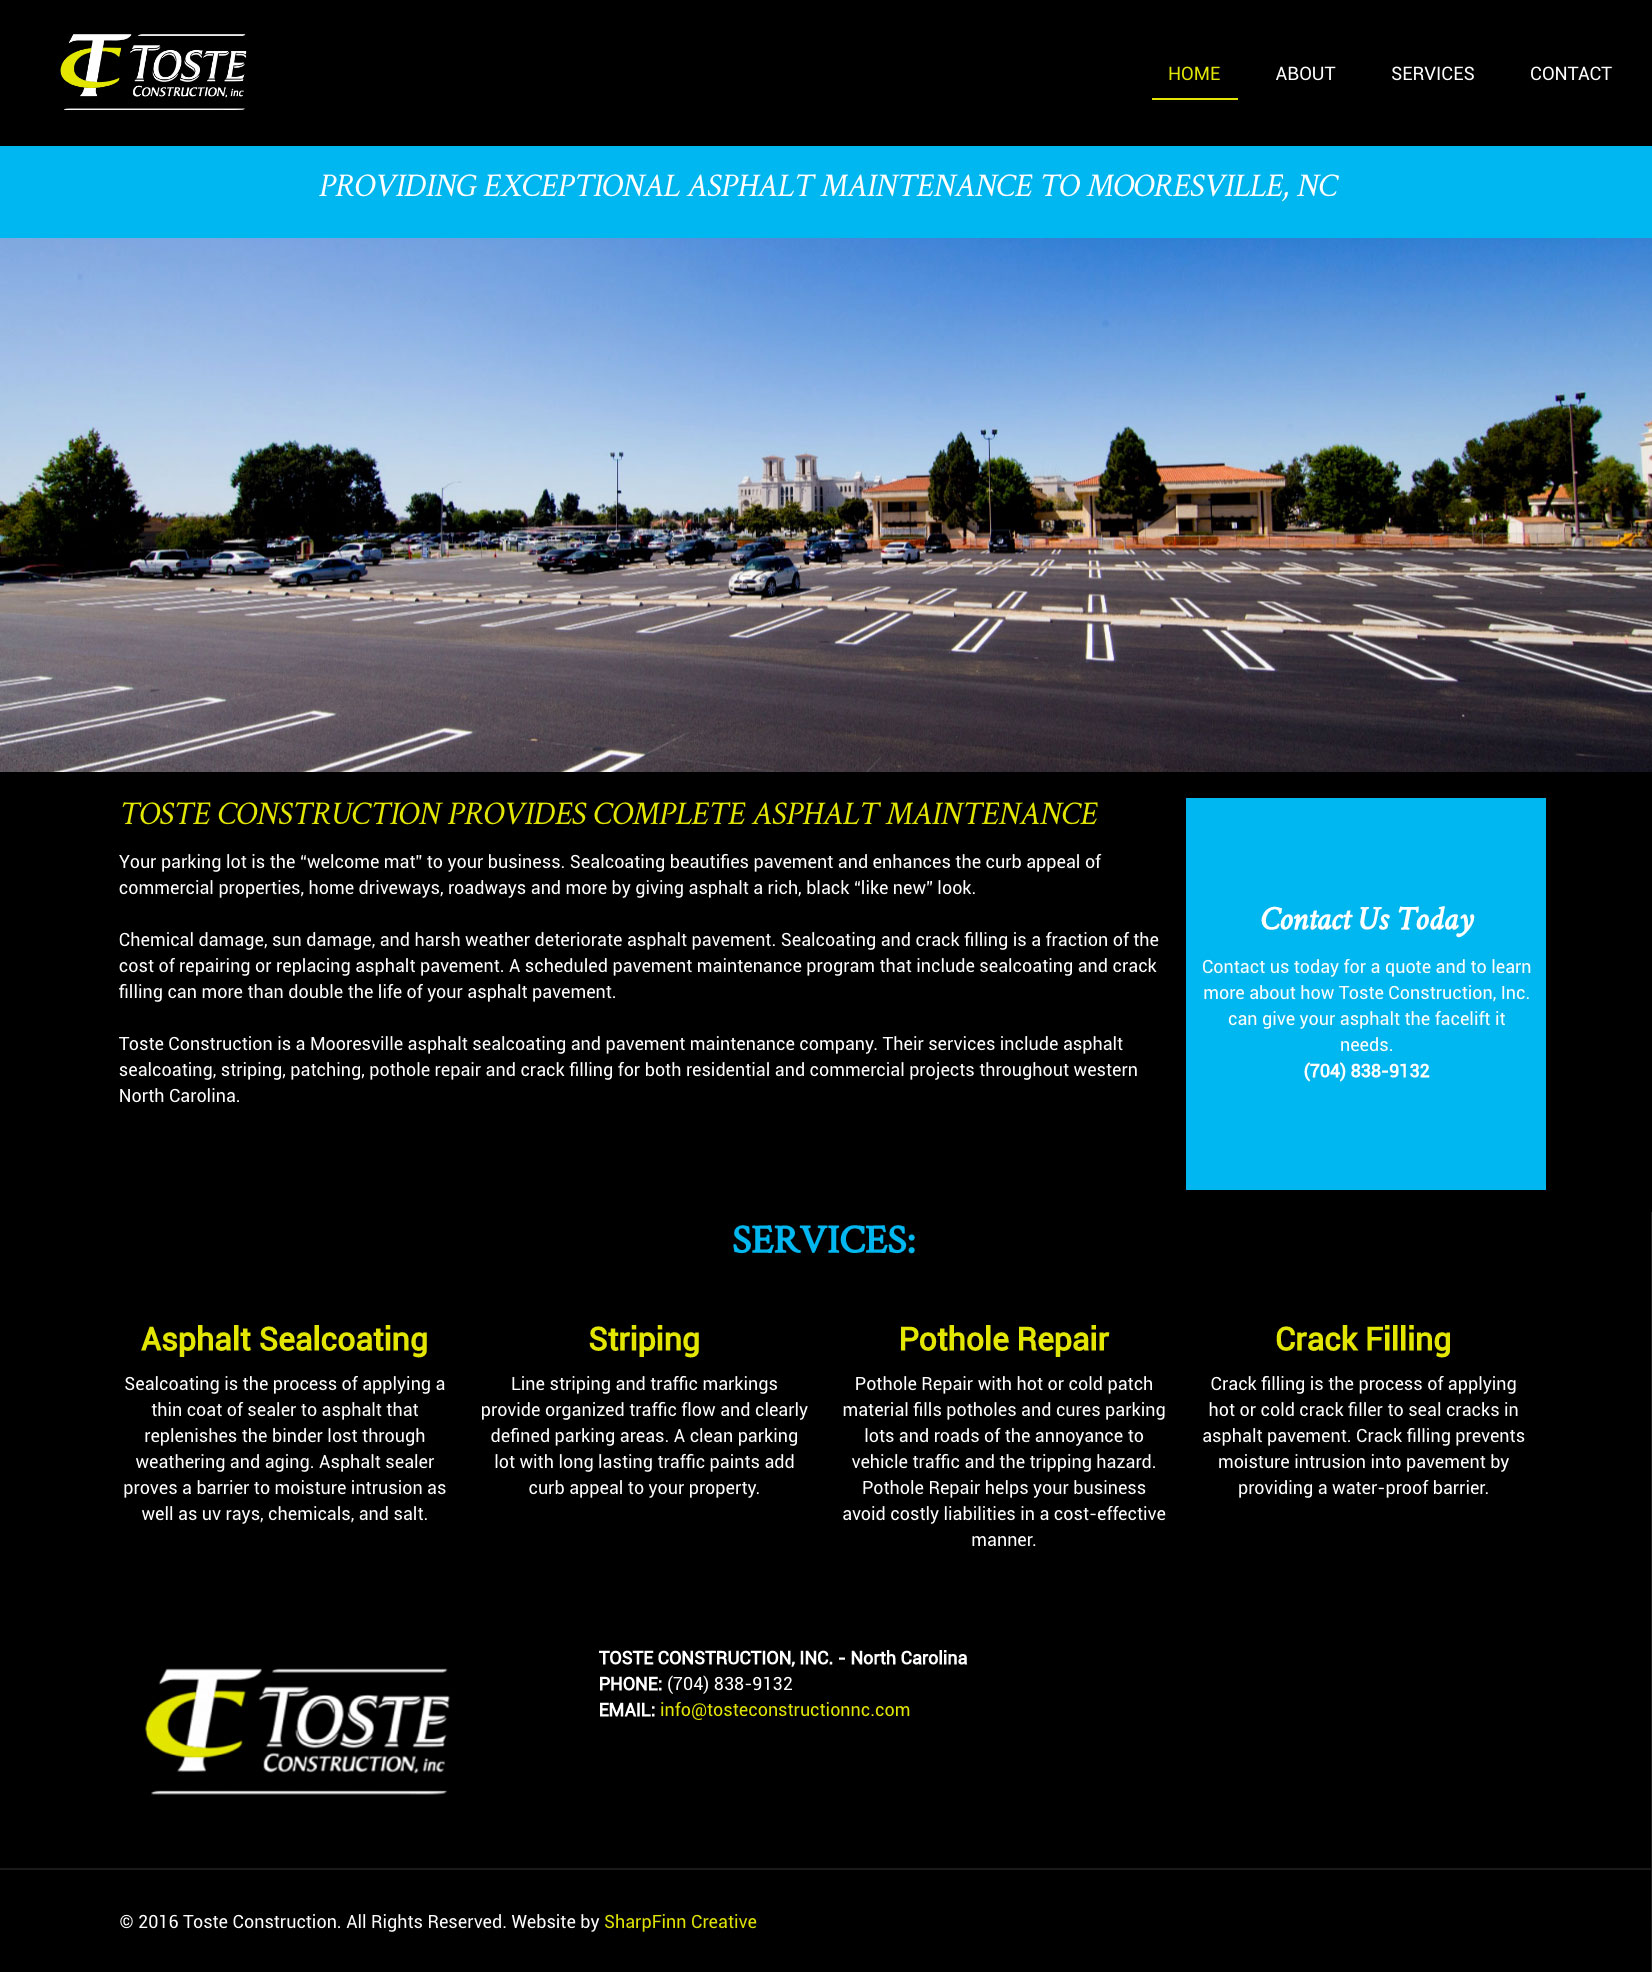 Toste Construction, Inc. North Carolina | Website Design